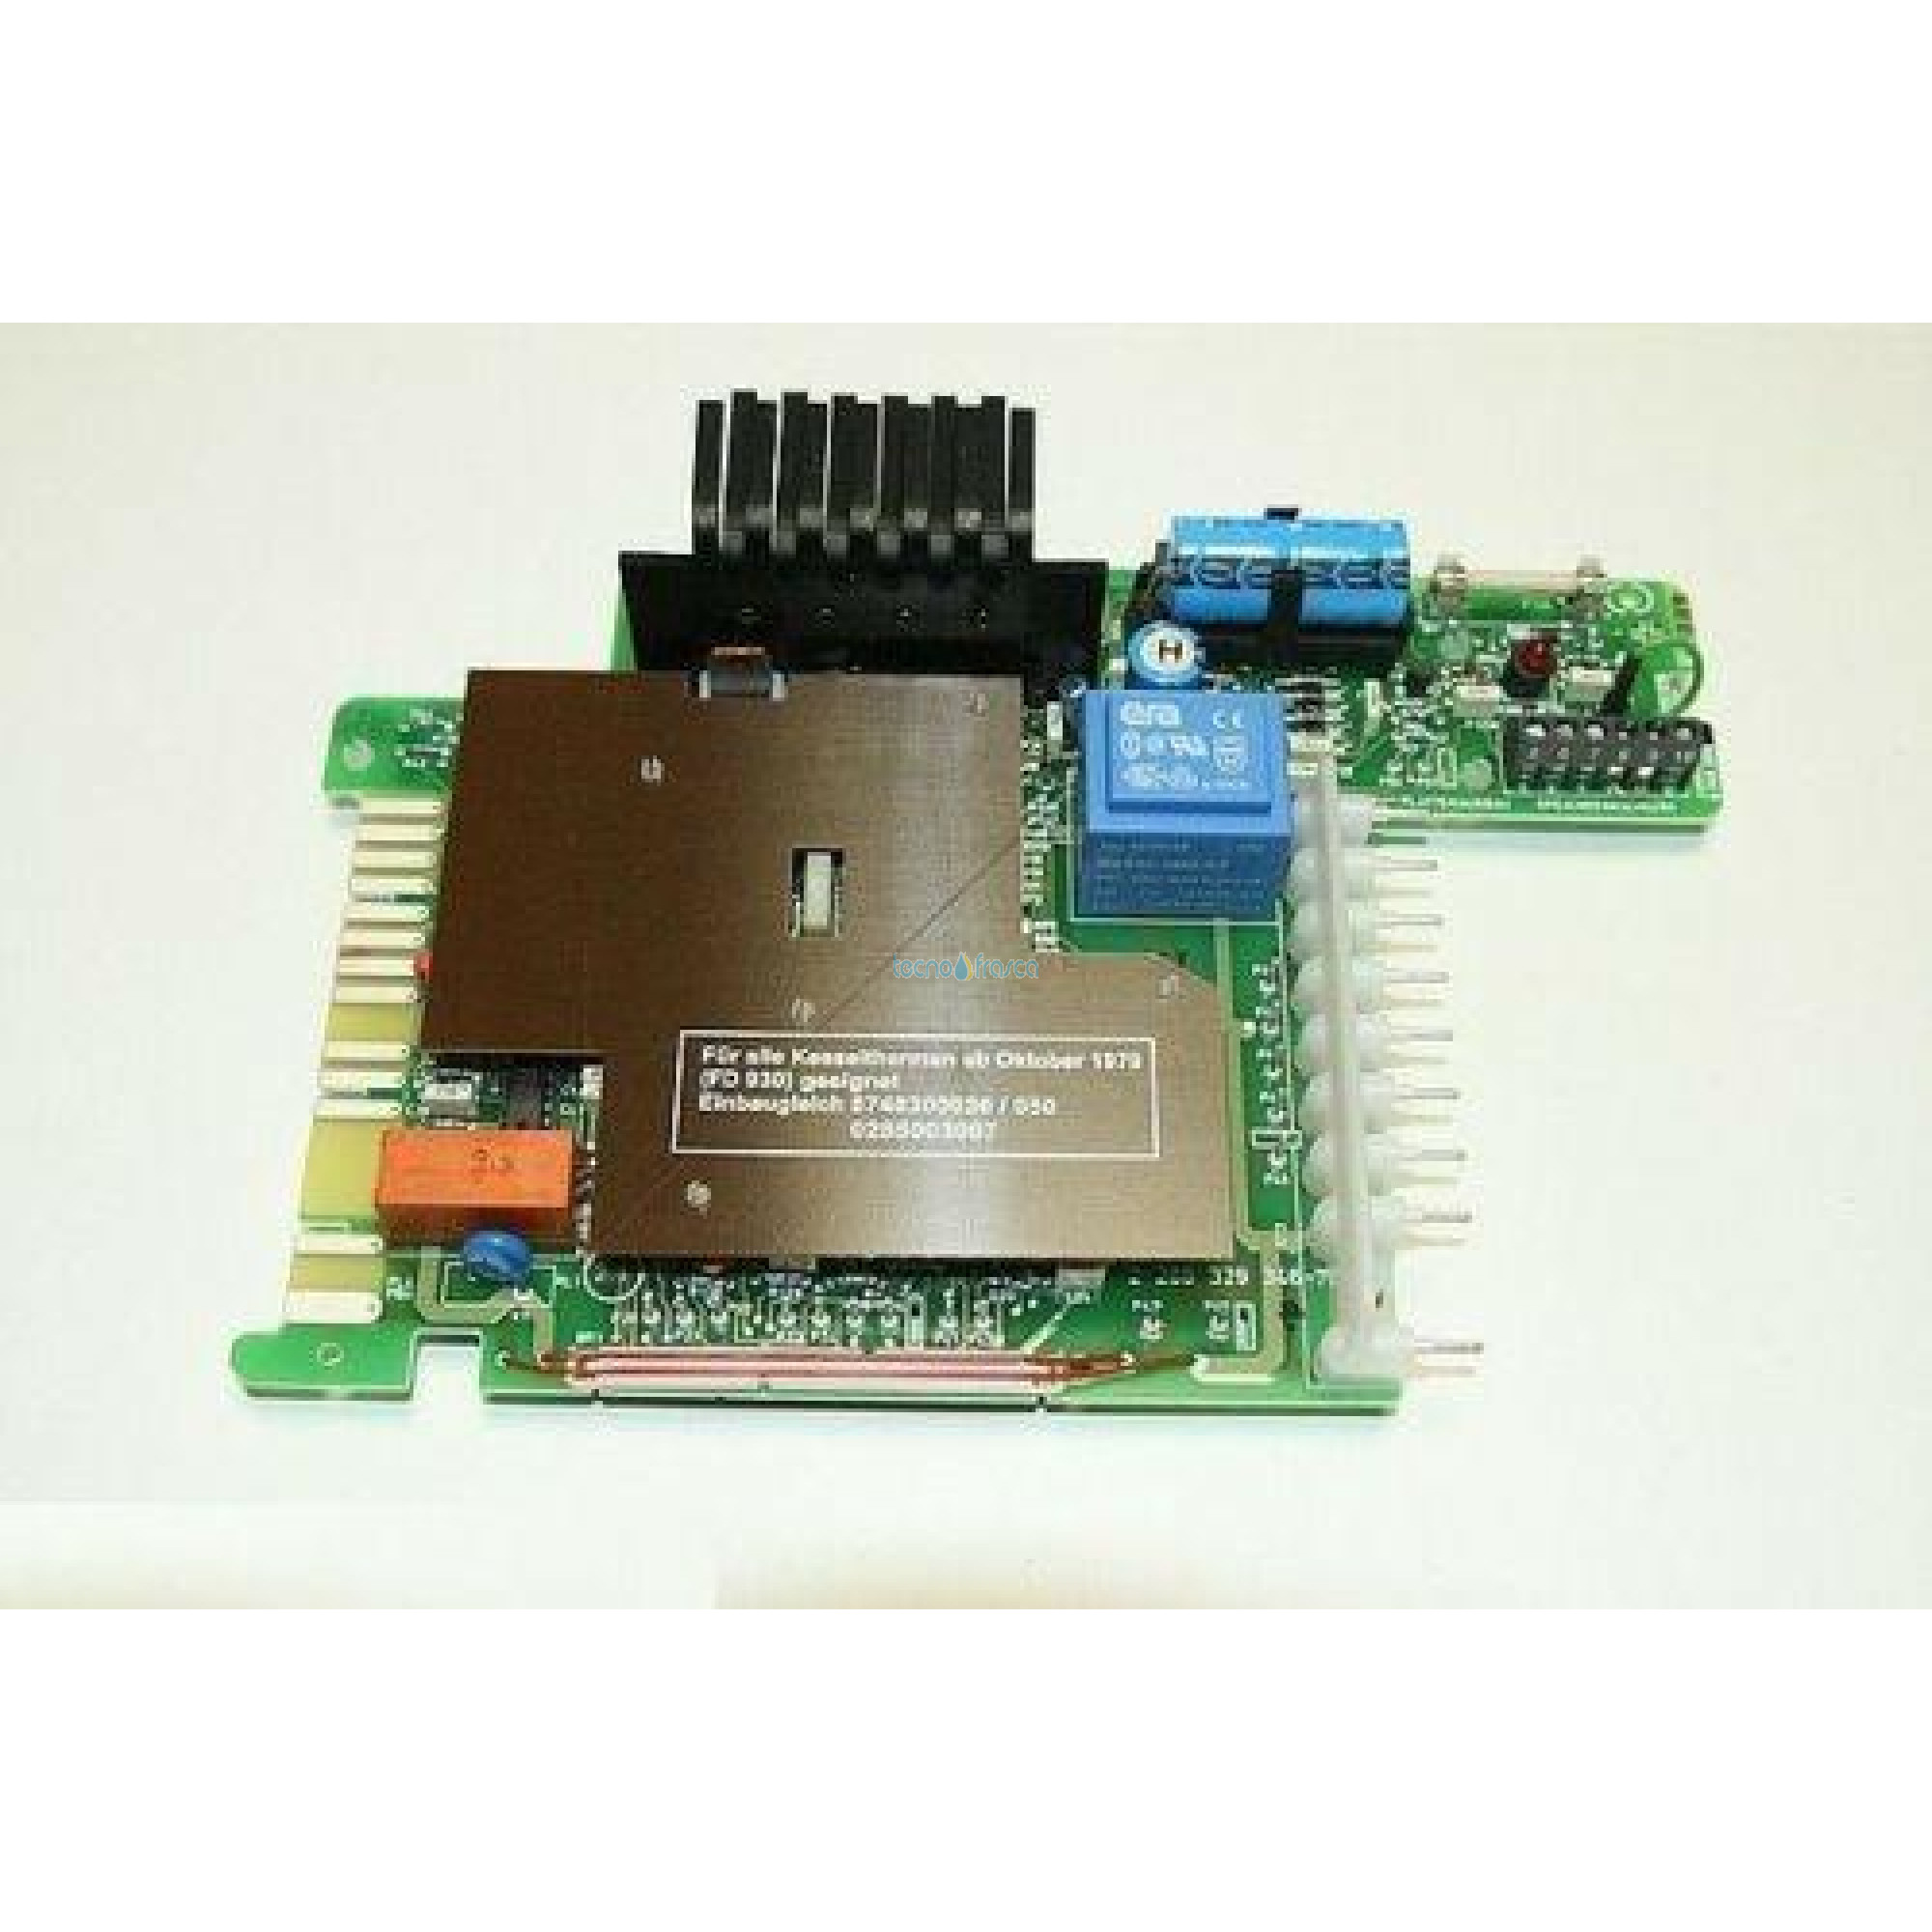 Junkers bosch scheda elettronica 8748300091